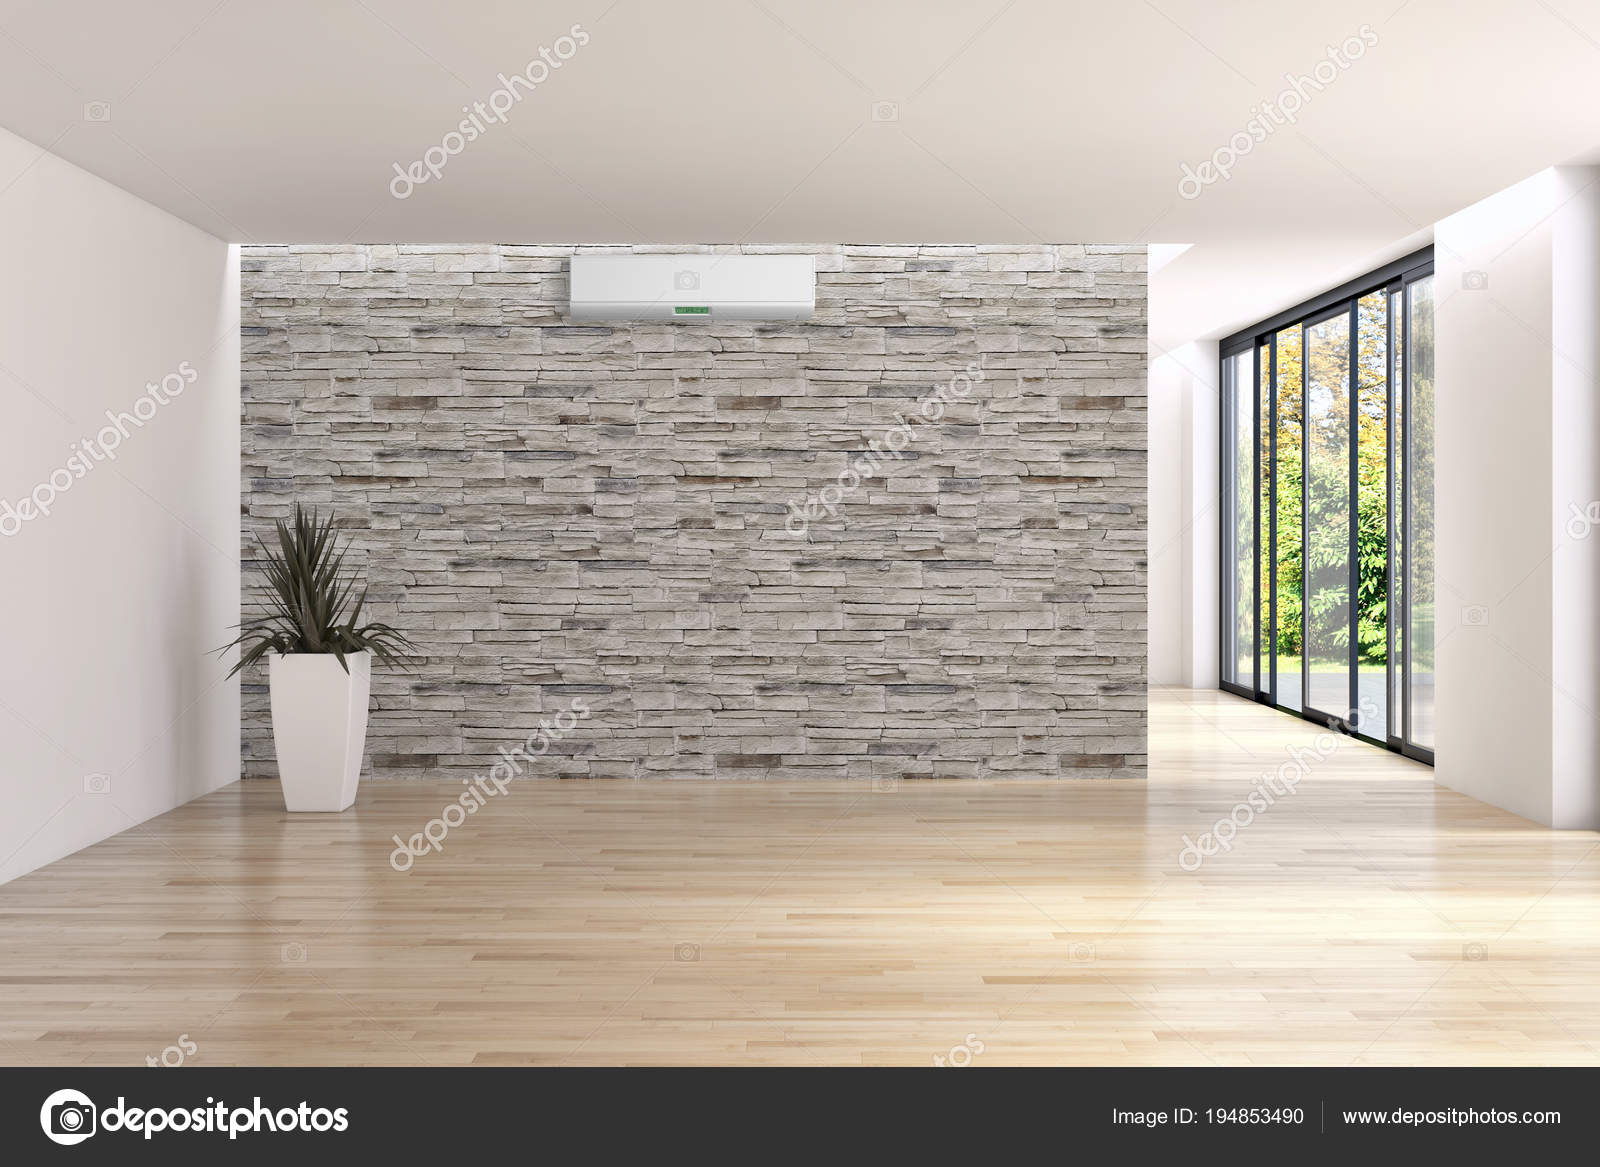 Modern interieur appartement met airconditioning d rendering